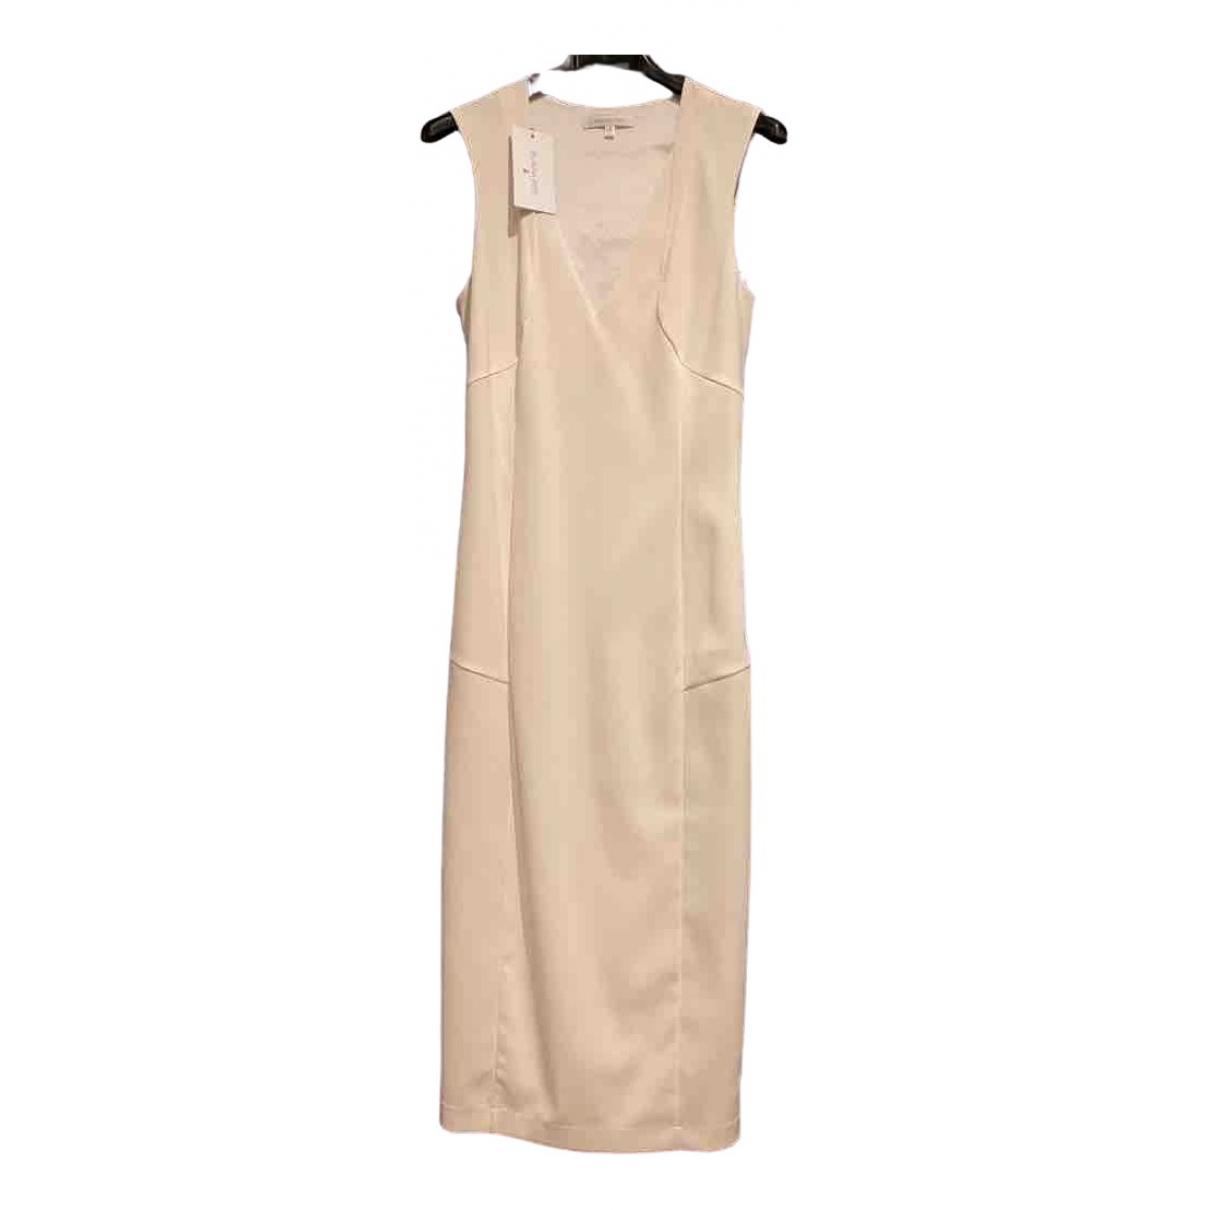 Patrizia Pepe \N Kleid in  Weiss Polyester